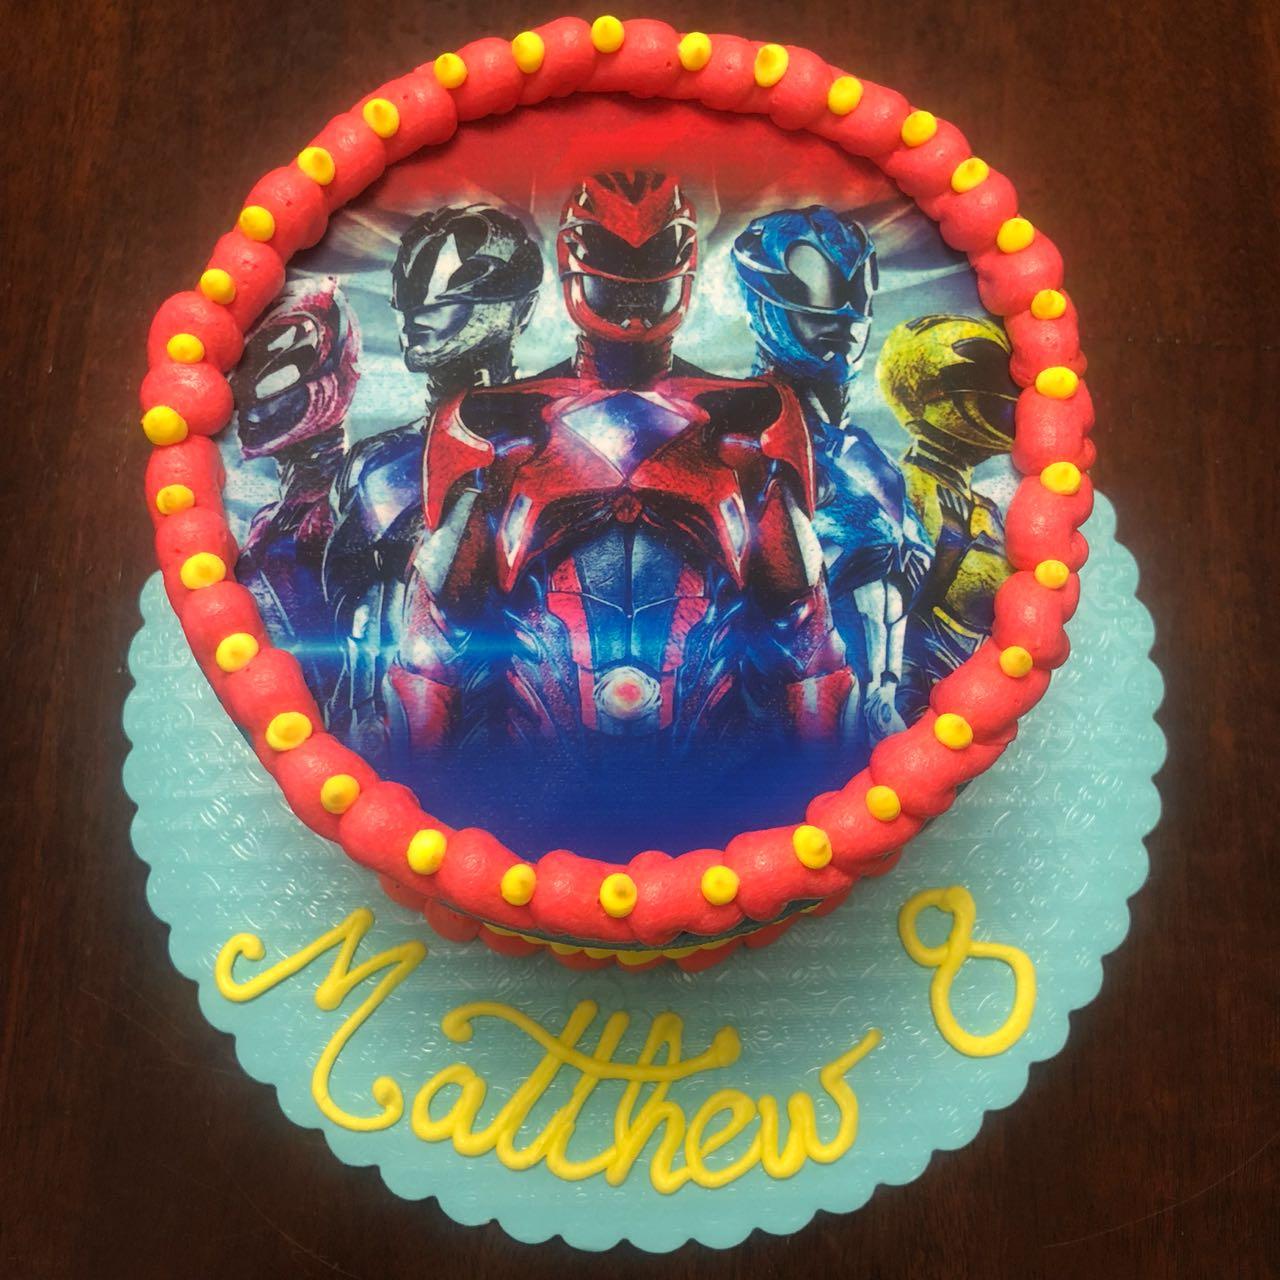 Vanilla Birthday Cake. Boy. Power Rangers. Red, yellow, blue. happy birthday